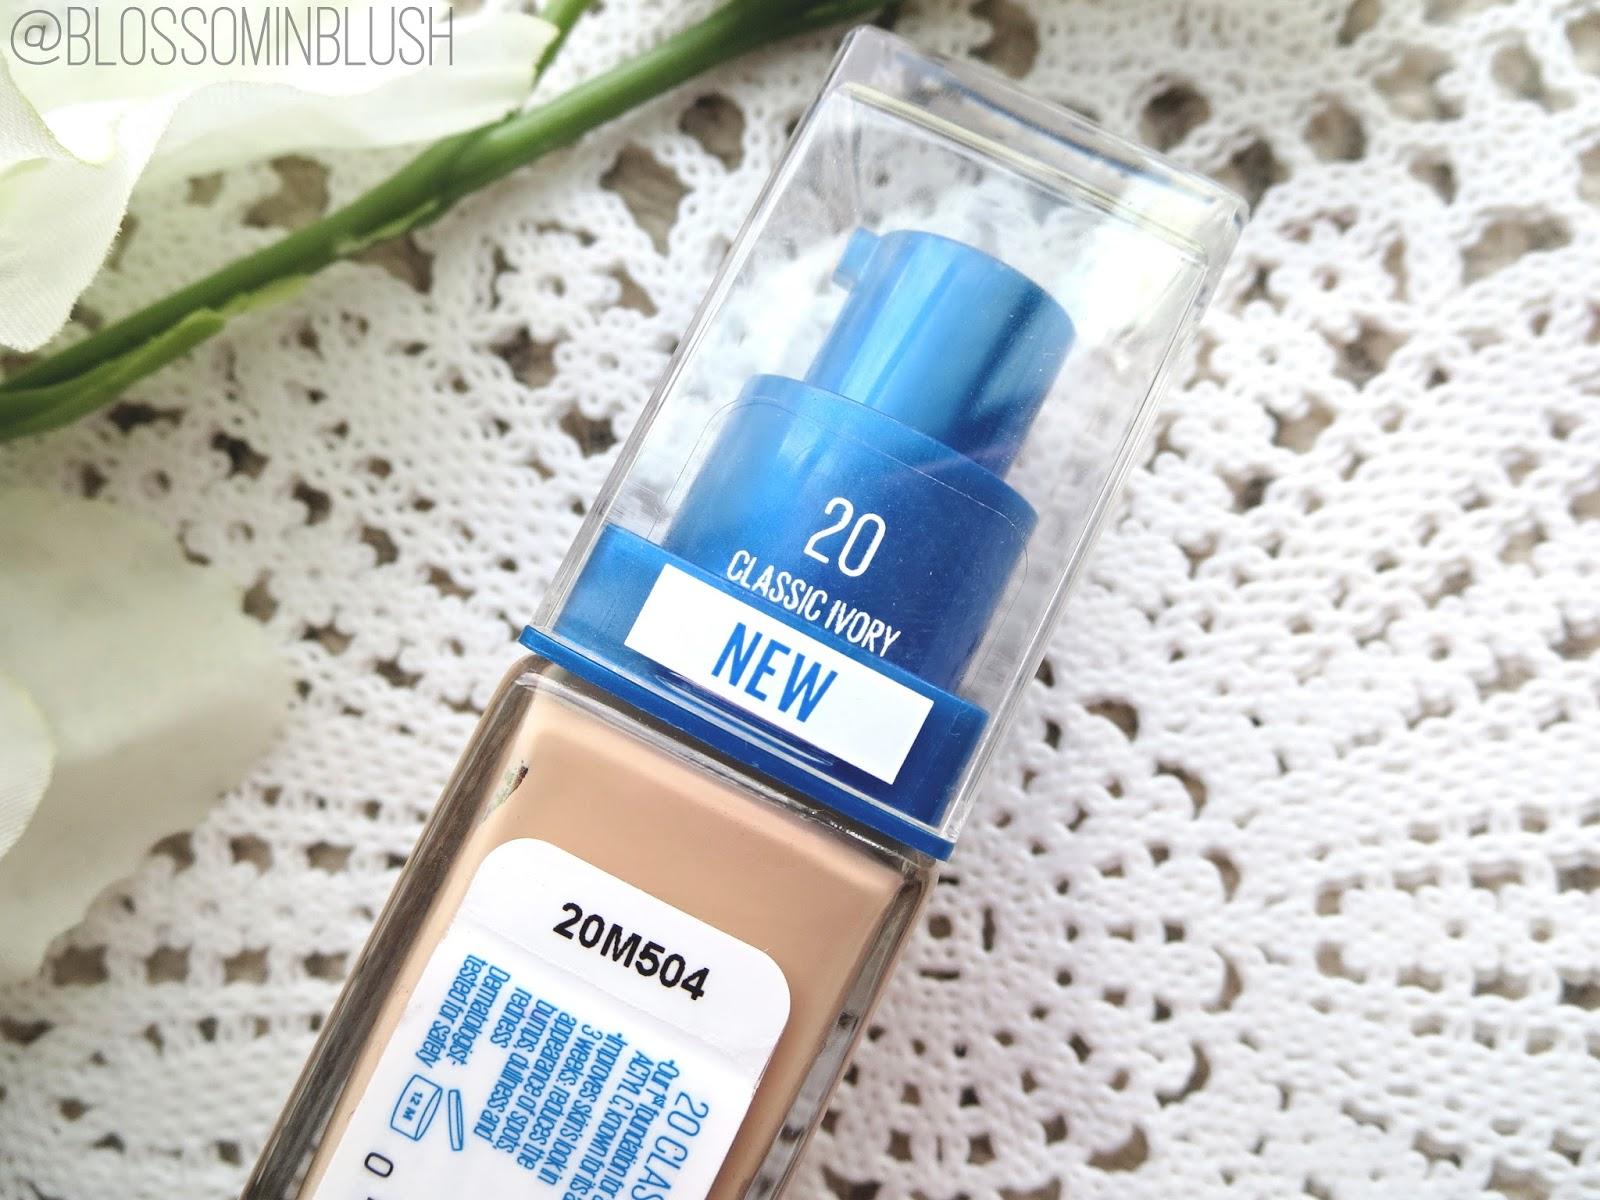 Superstay Better Skin Powder by Maybelline #22